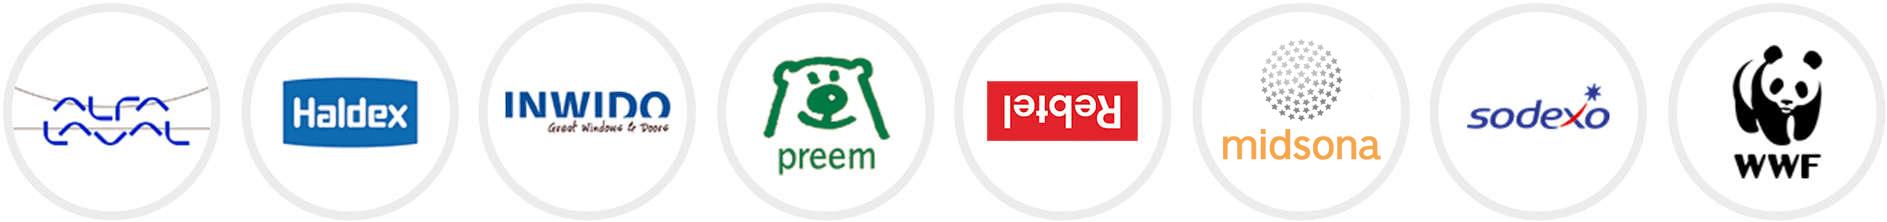 Varumärken